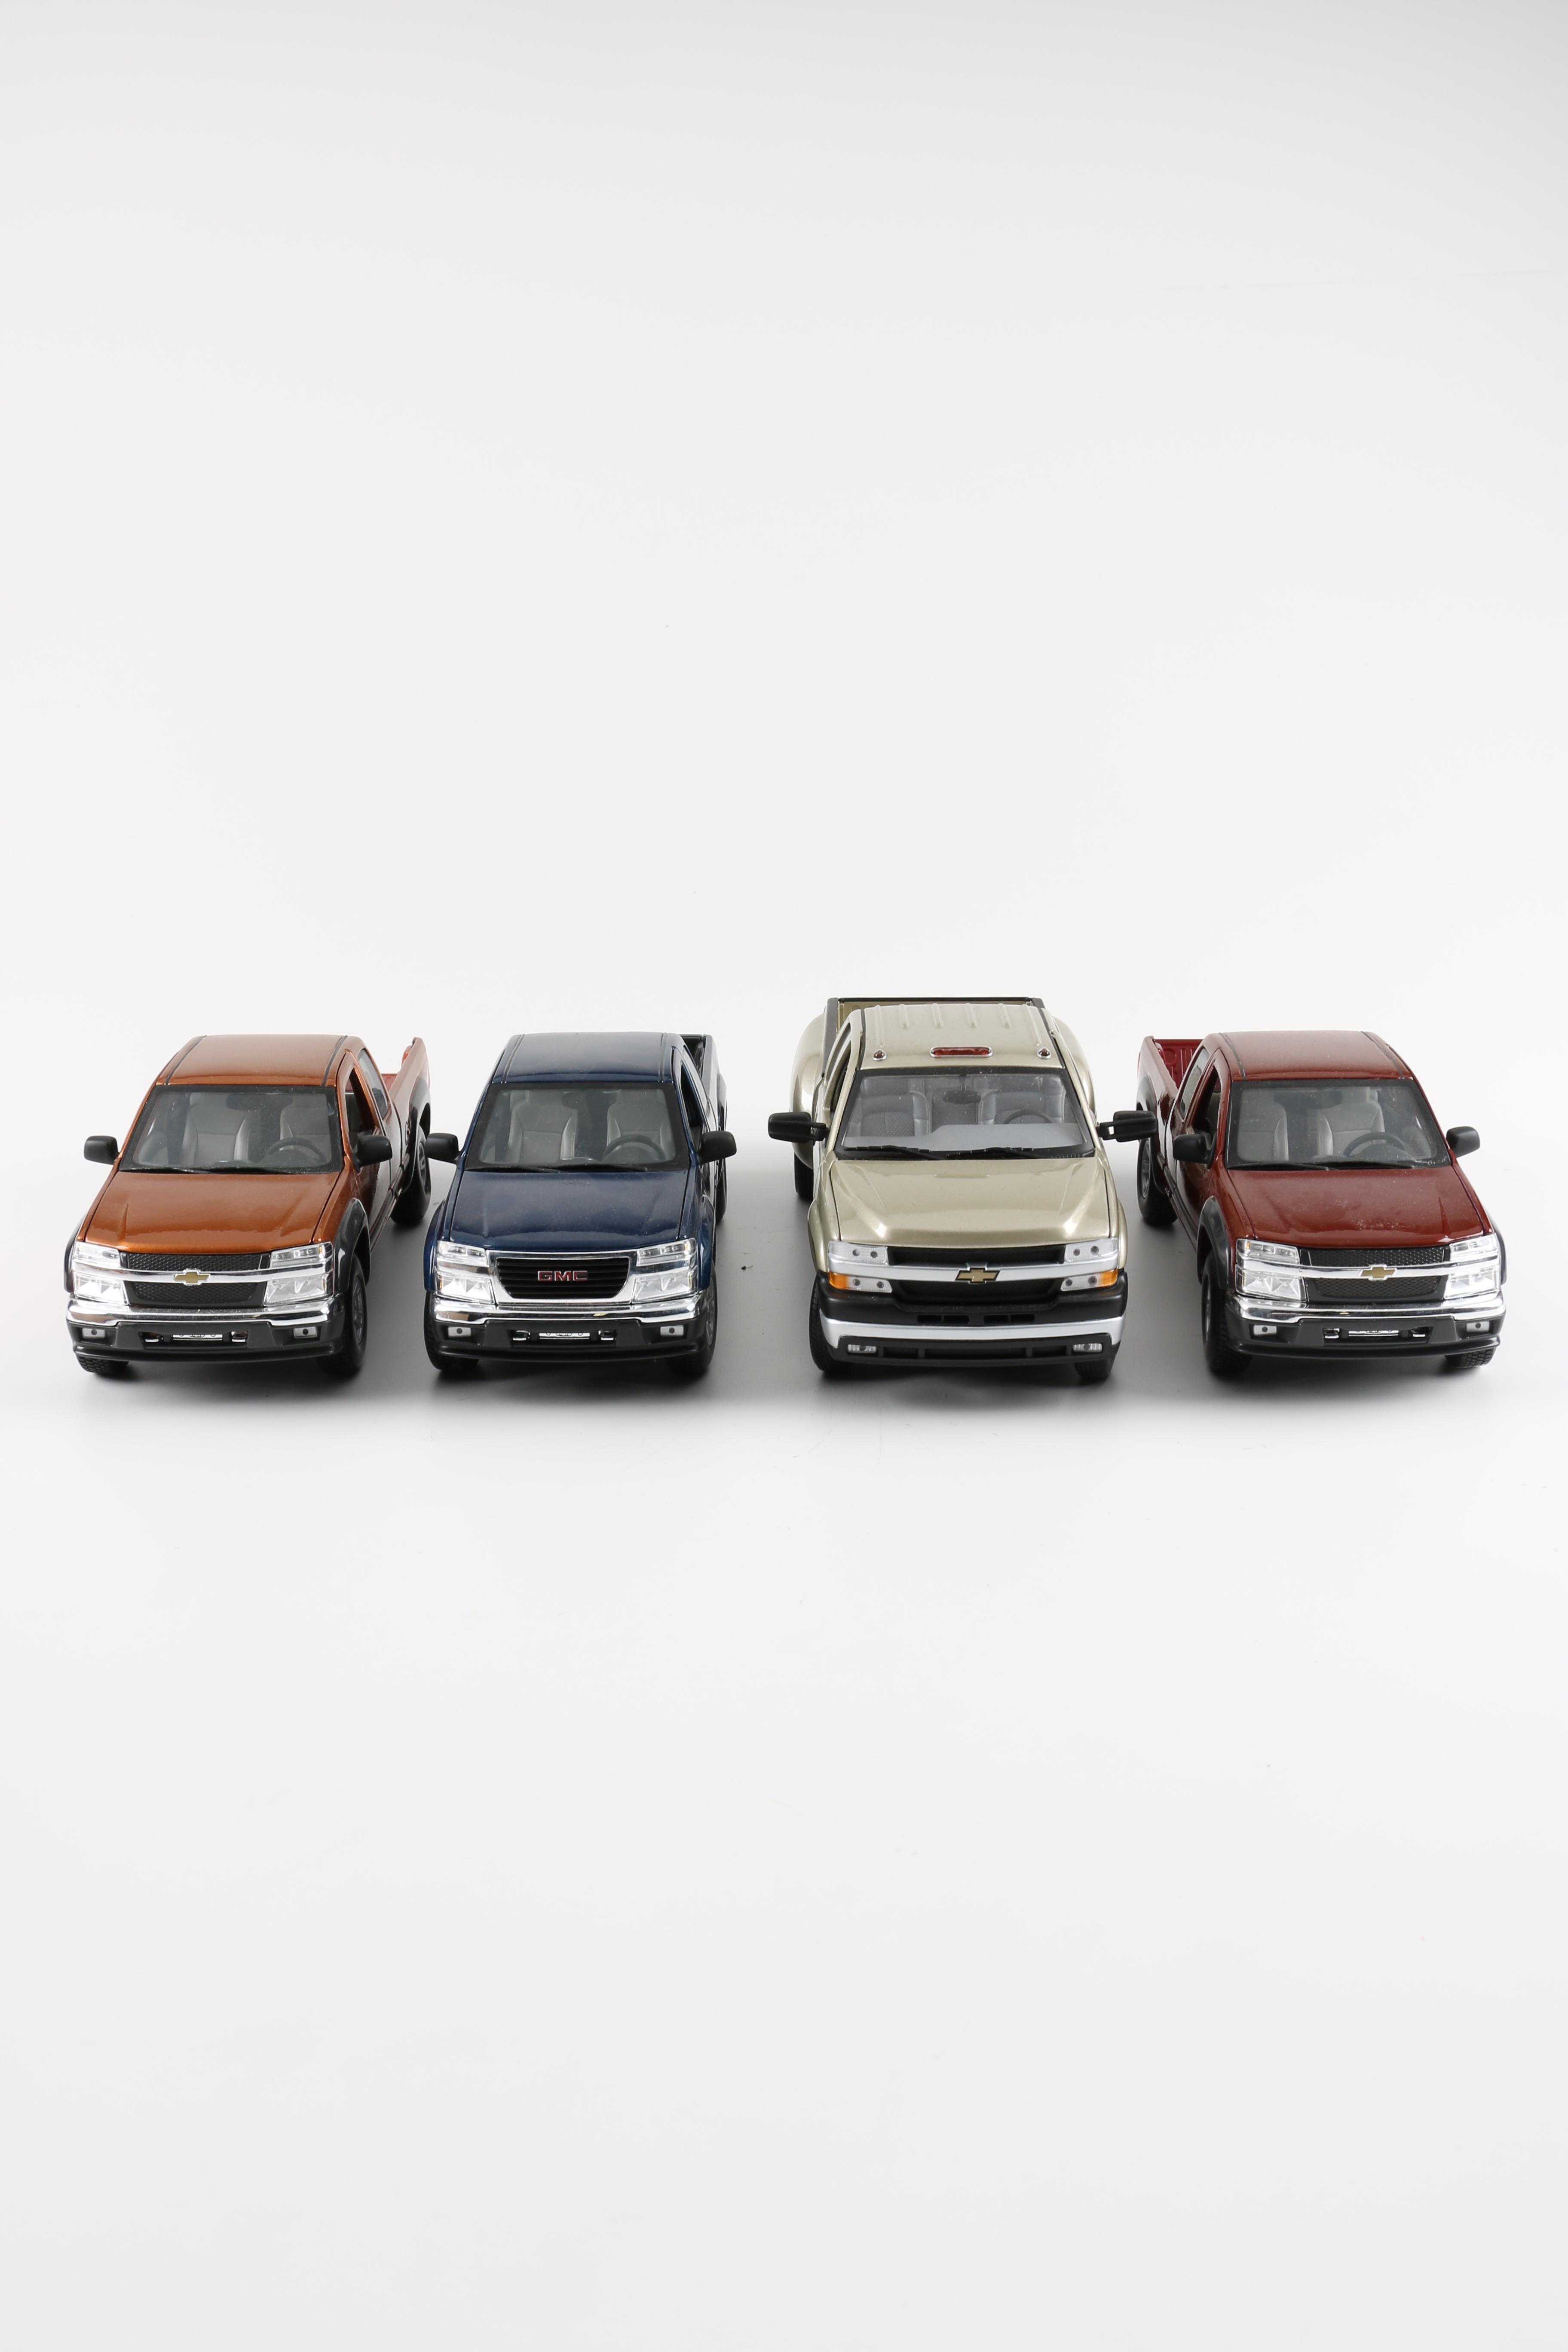 Die-Cast Chevrolet Pickup Trucks